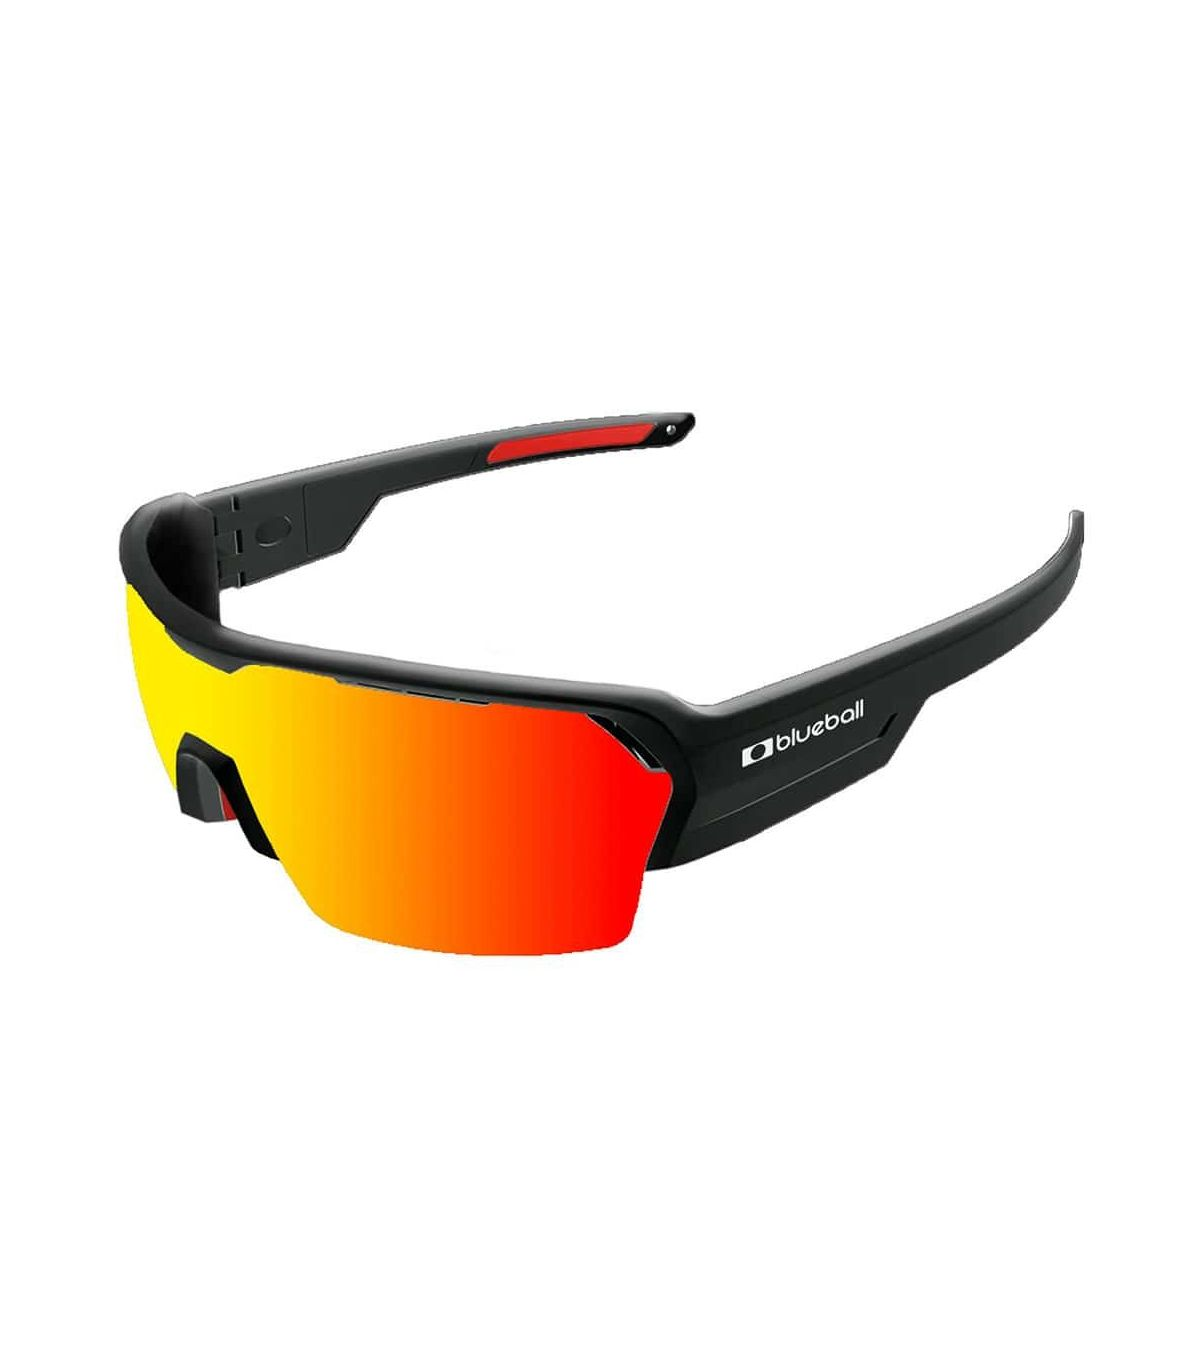 Blueball Aizkorri Shinny Black / Revo Red Blueball Gafas de Sol Sport Gafas de Sol Color: negro